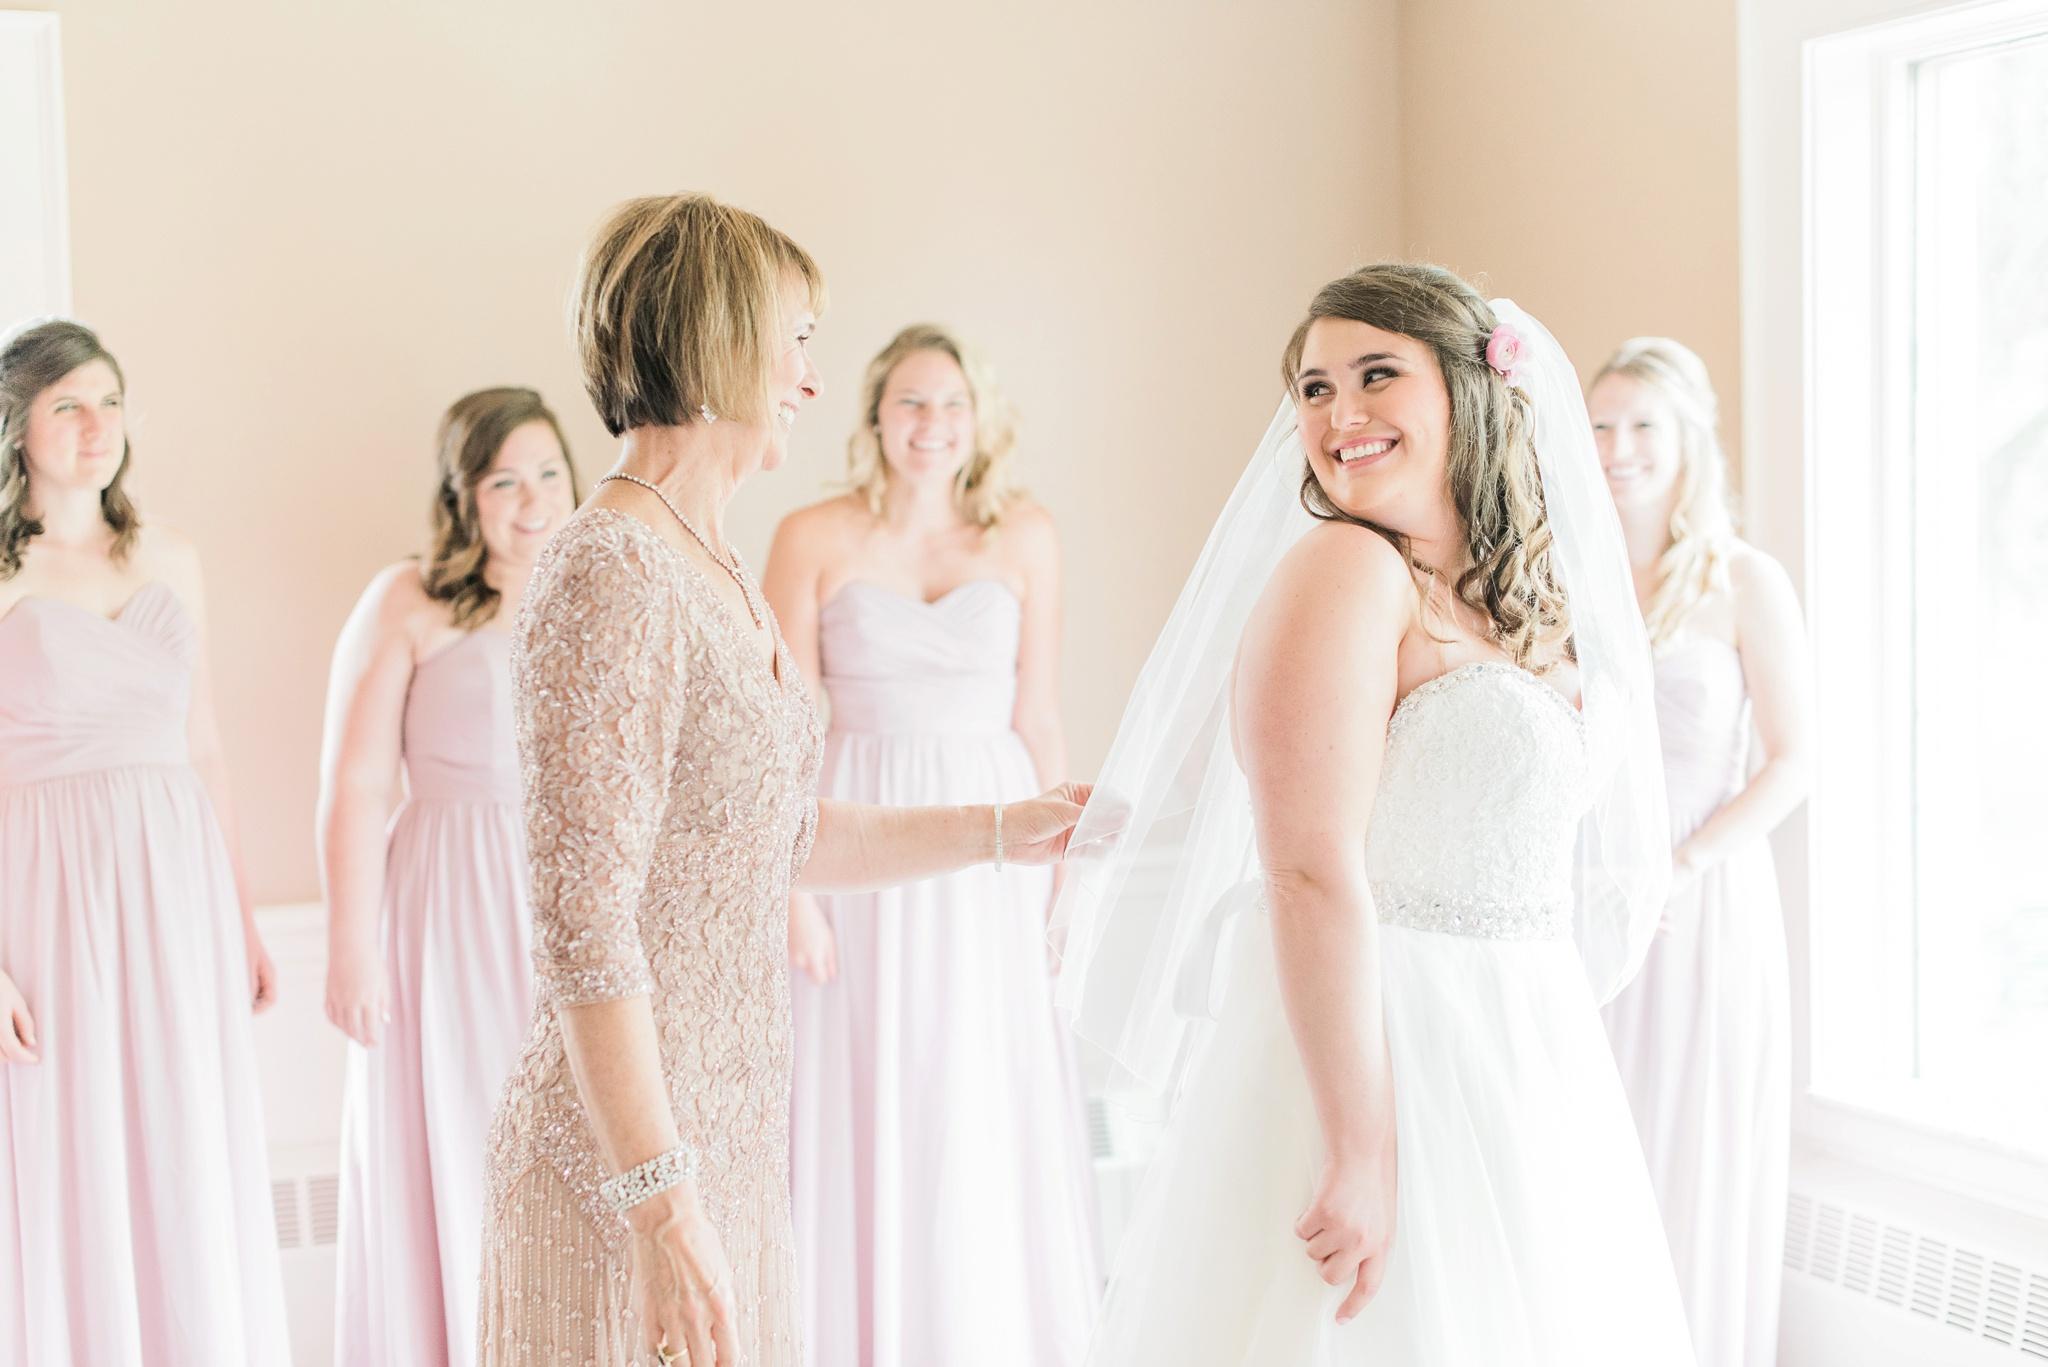 worthington-hills-country-club-wedding-columbus-ohio-meg-evan_0017.jpg